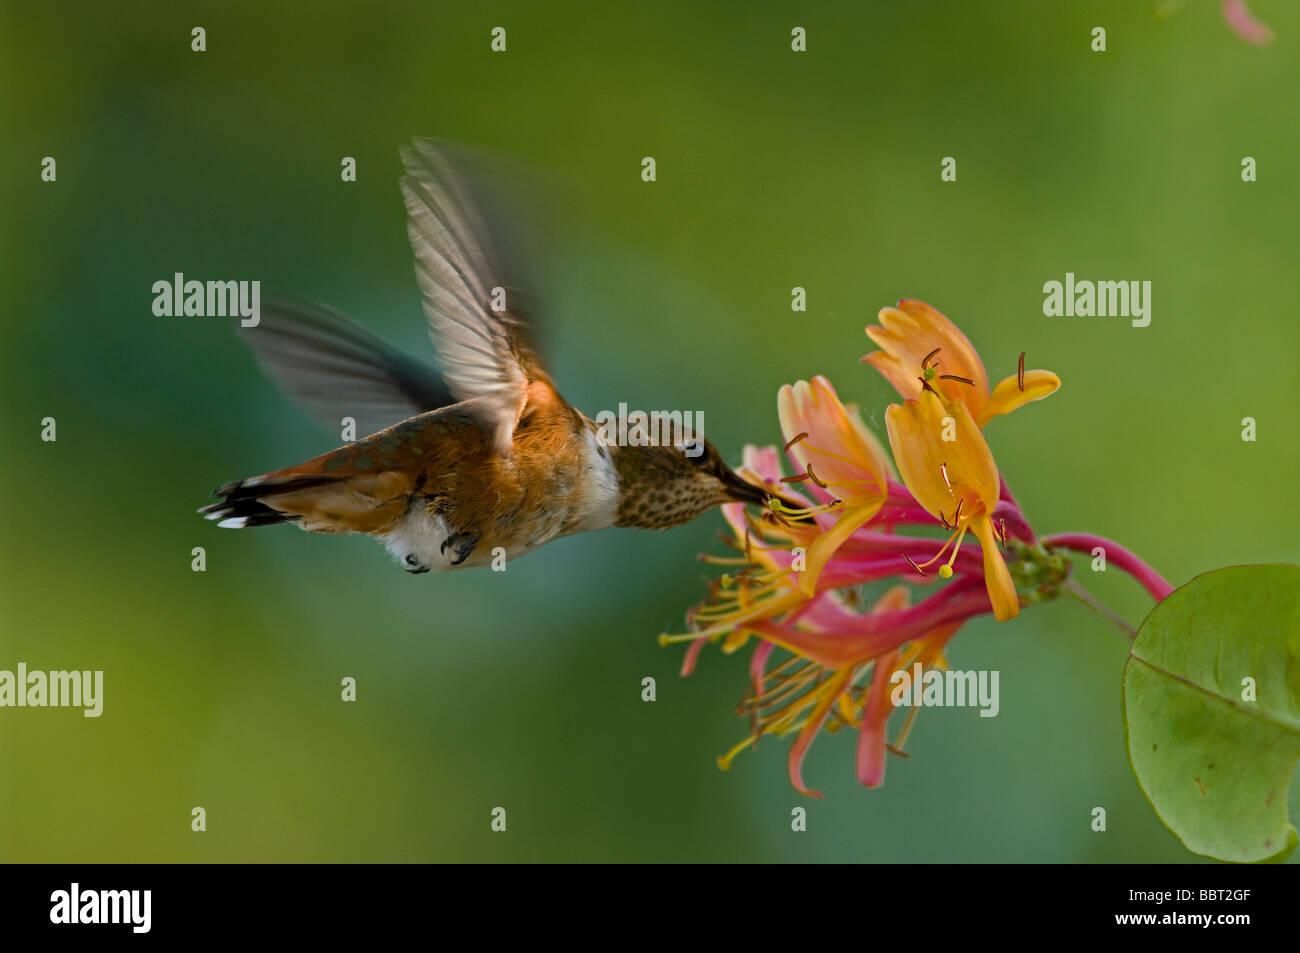 Humming Bird en sirotant le nectar des fleurs de chèvrefeuille Photo Stock